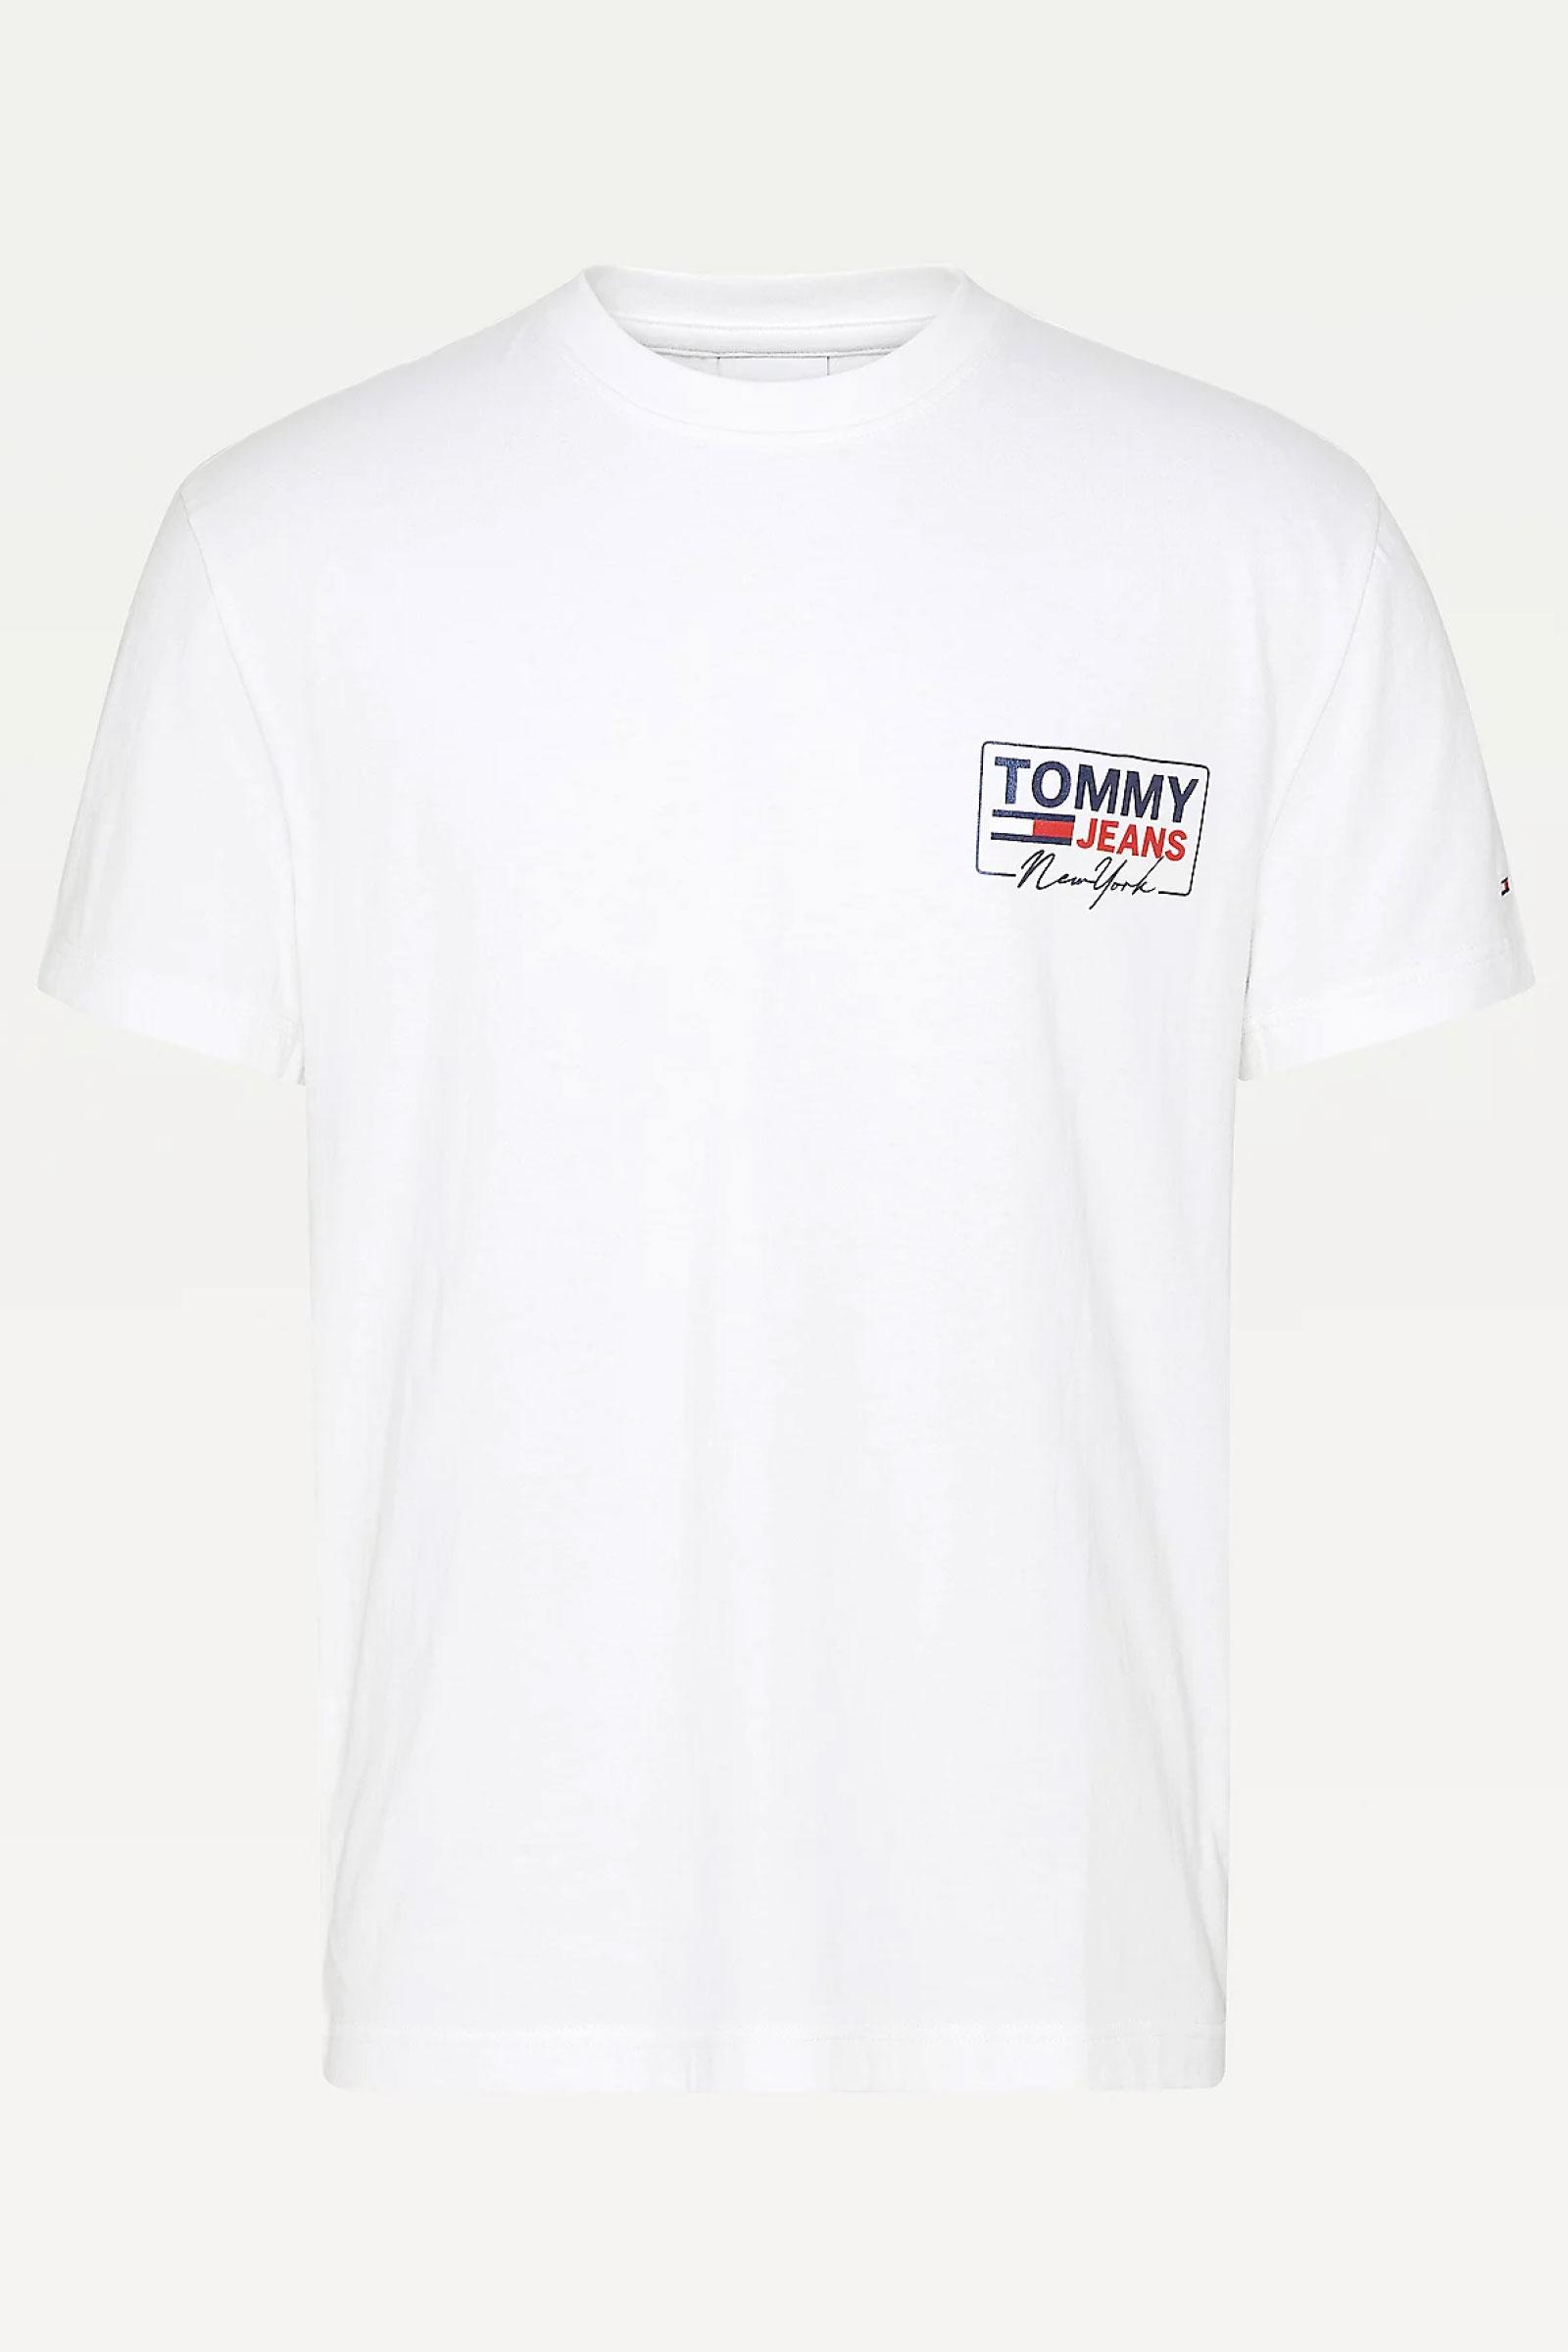 TOMMY JEANS T-Shirt Uomo TOMMY JEANS   T-Shirt   DM0DM10216YBR